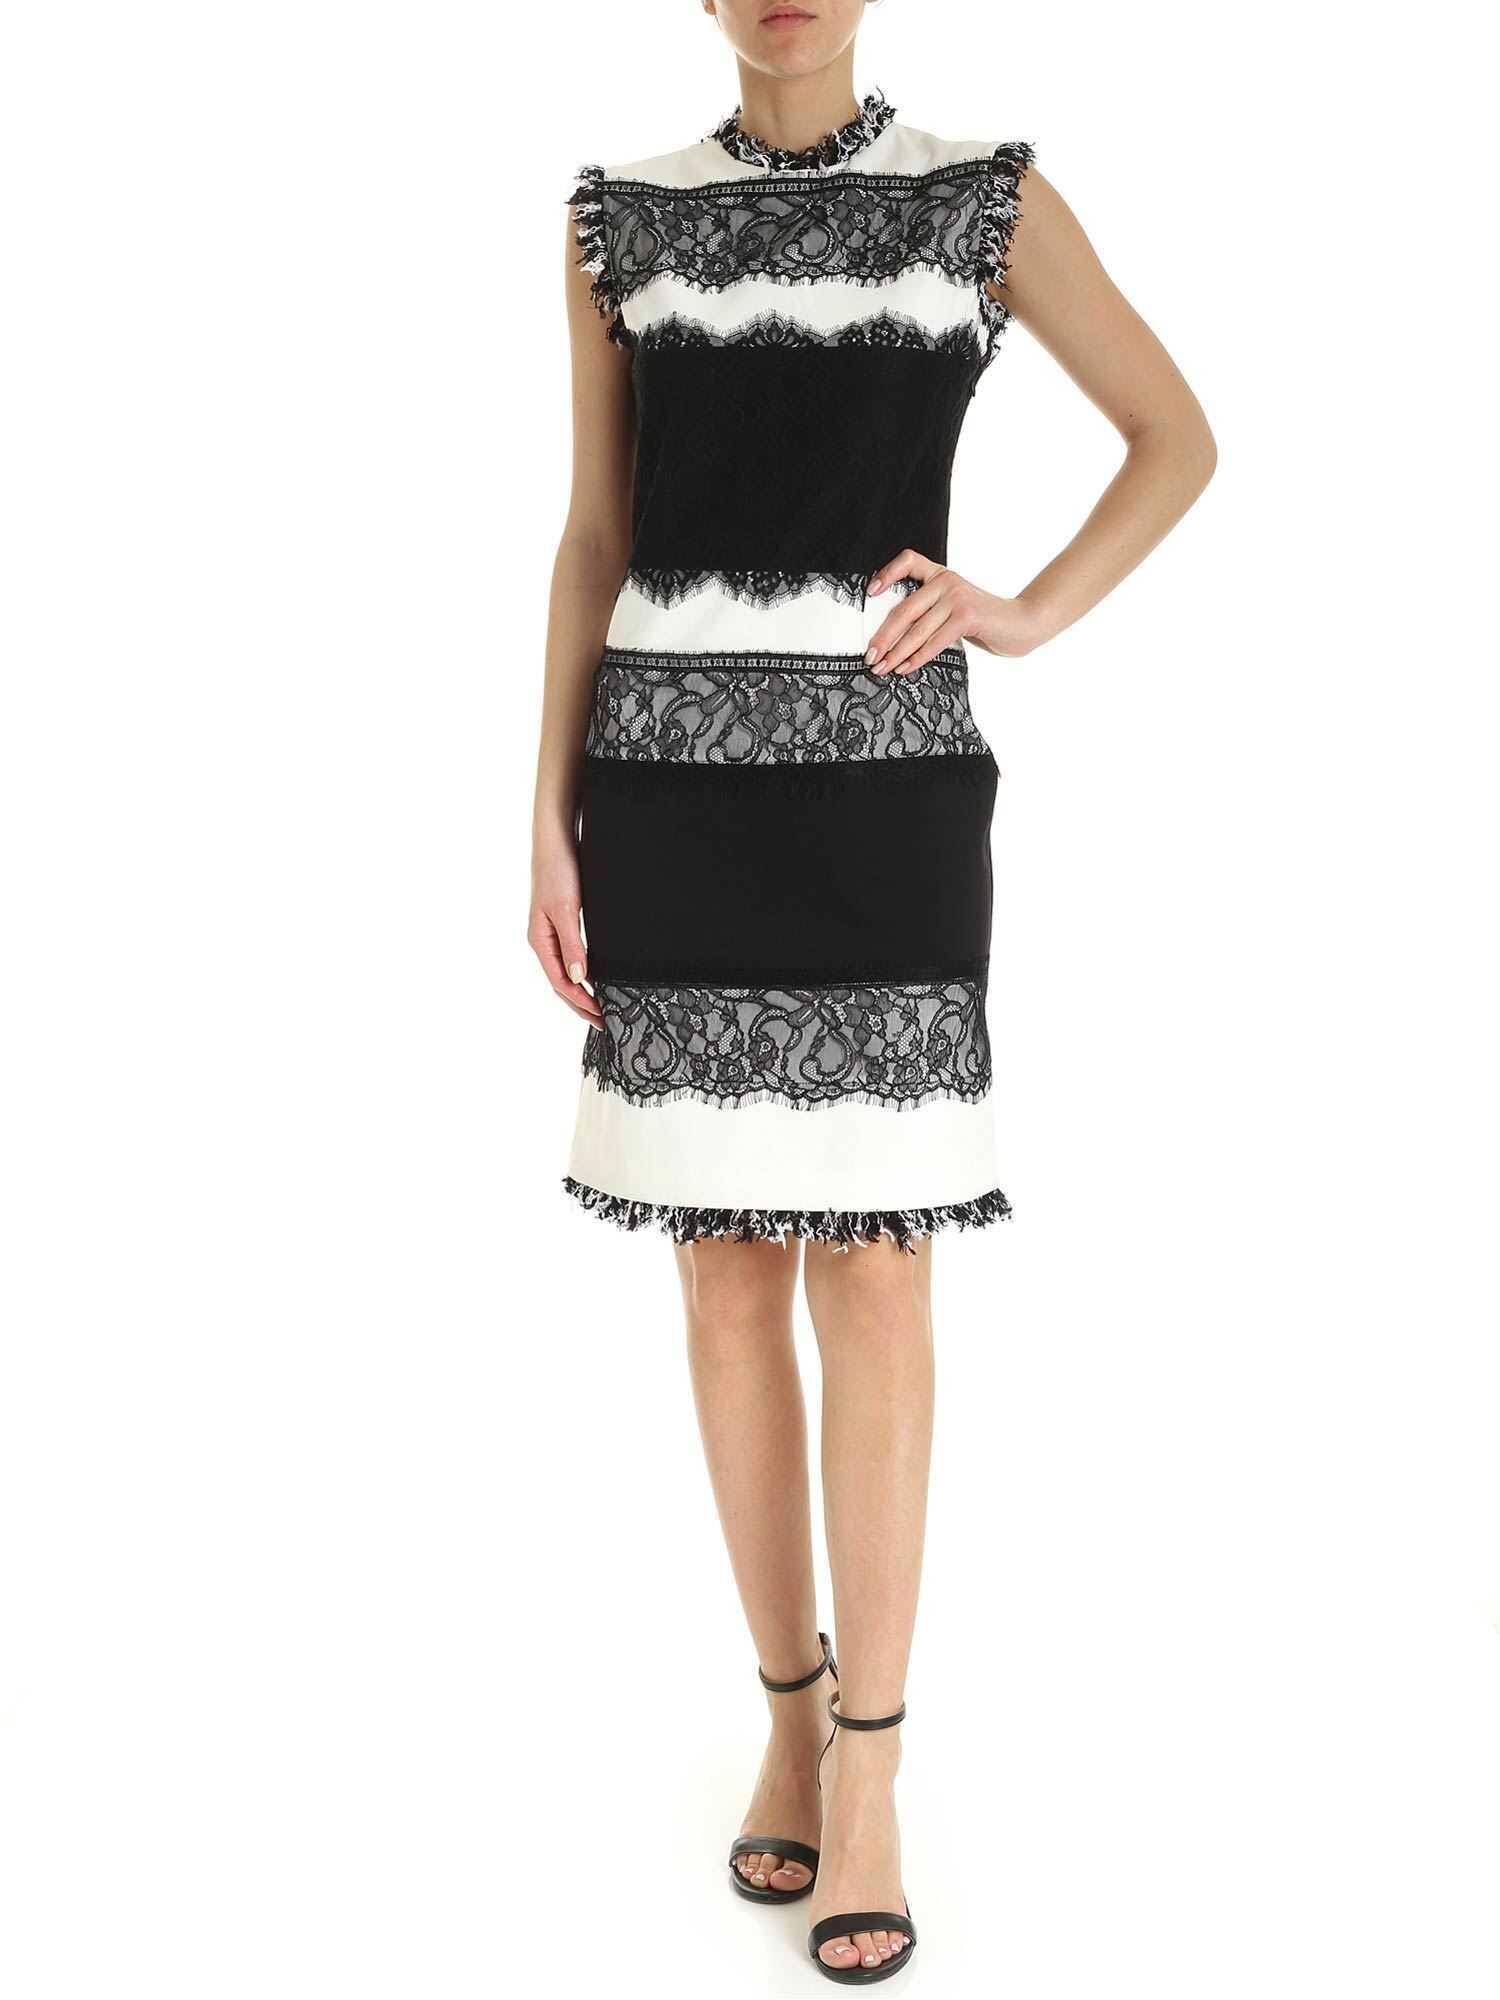 Twin-set Simona Barbieri Lace Trim Pencil Dress In Black And White Black